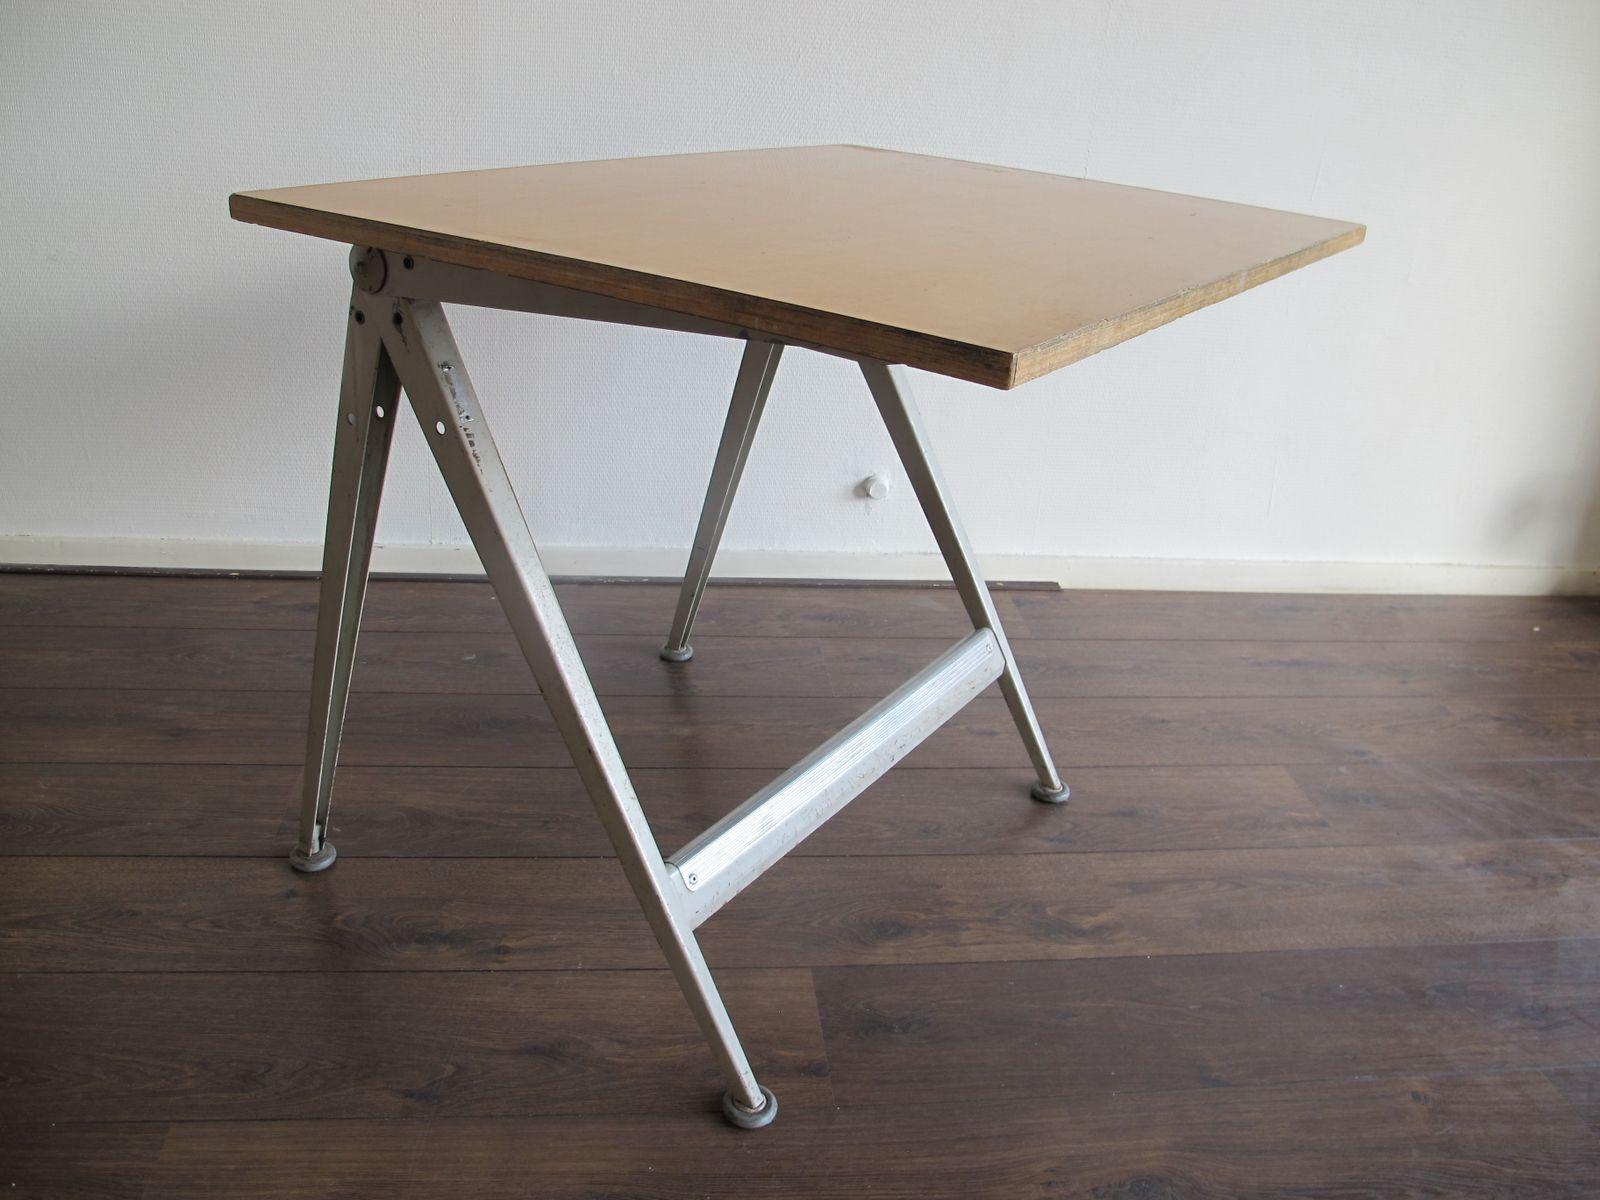 Vintage Reply Worktable By Wim Rietveld U0026 Friso Kramer For Ahrend De Cirkel